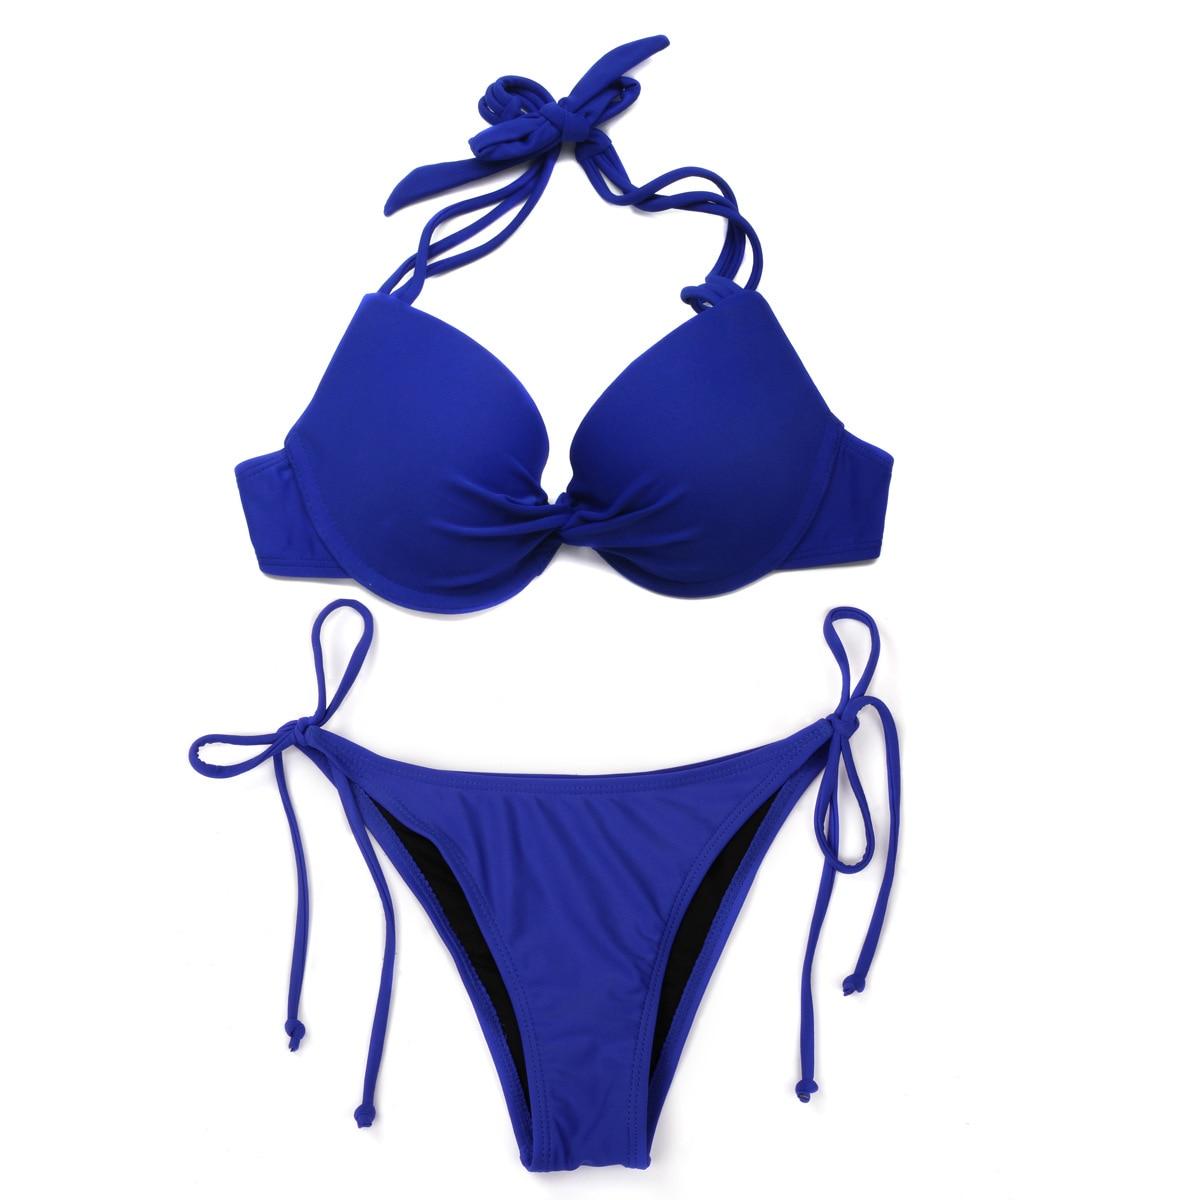 Sujetador azul Sexy traje de baño zafiro azul Bikini Bandeau Sexy plisado Mujer traje de baño femenino brasileño Push Up